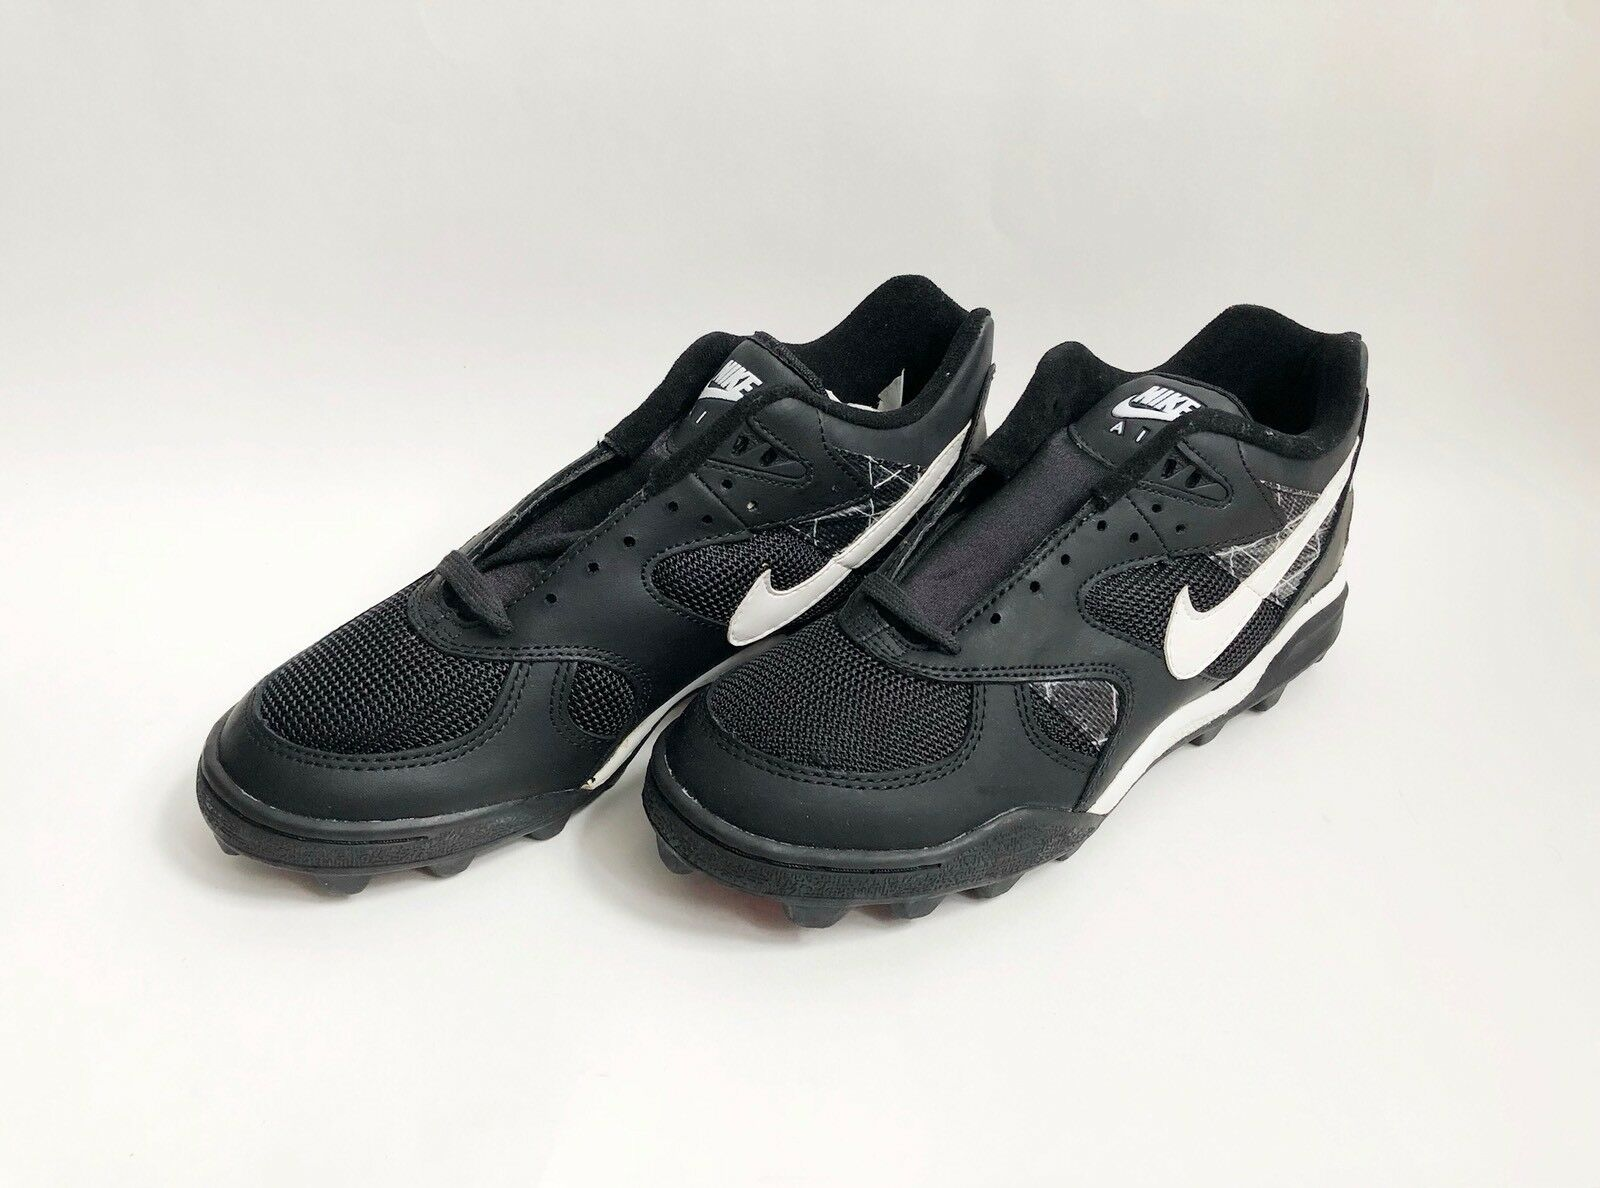 Vintage Nike Nike Vintage Boss tiburón Fútbol Zapatos para hombre Air DEADSTOCK Nuevo en Caja 2018 a3037e